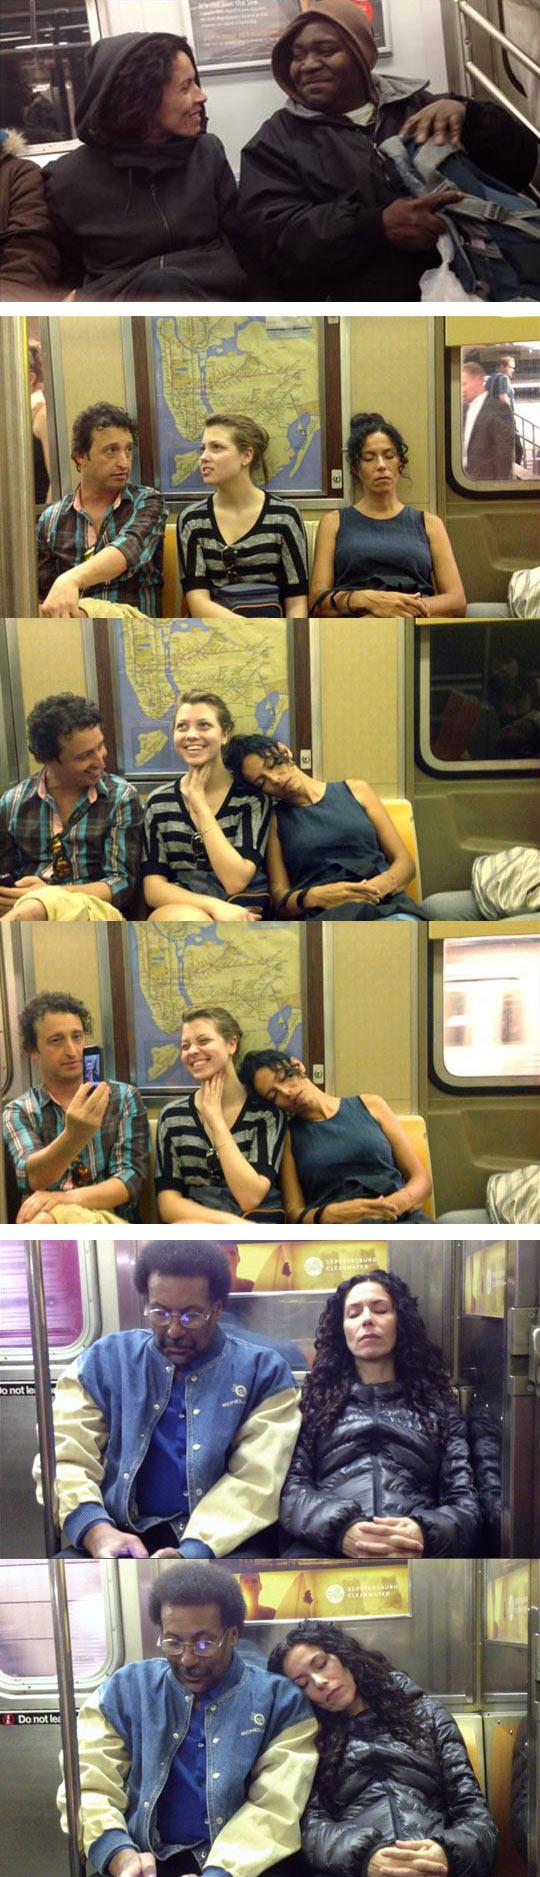 funny-artist-reaction-strangers-photo